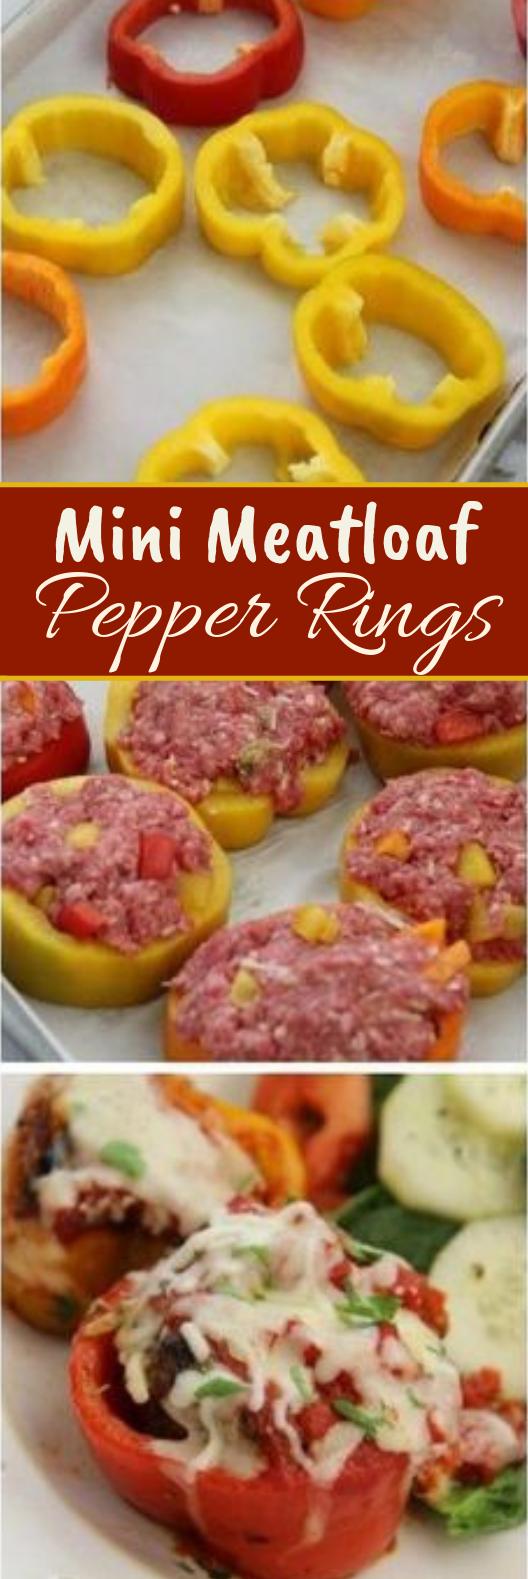 Mini Meatloaf Pepper Rings #keto #lowcarb